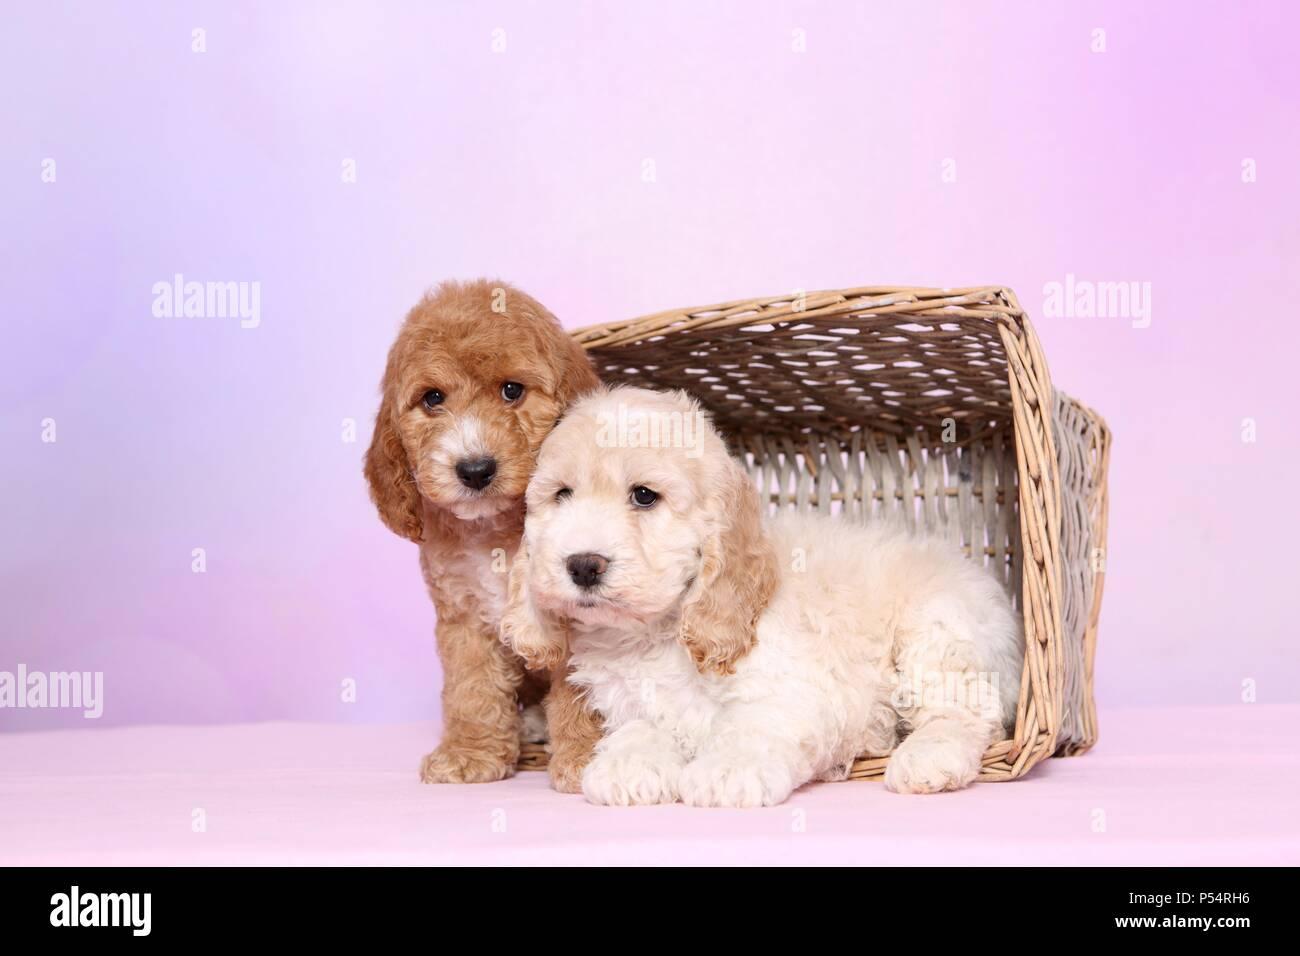 Cockerpoo Puppies - Stock Image